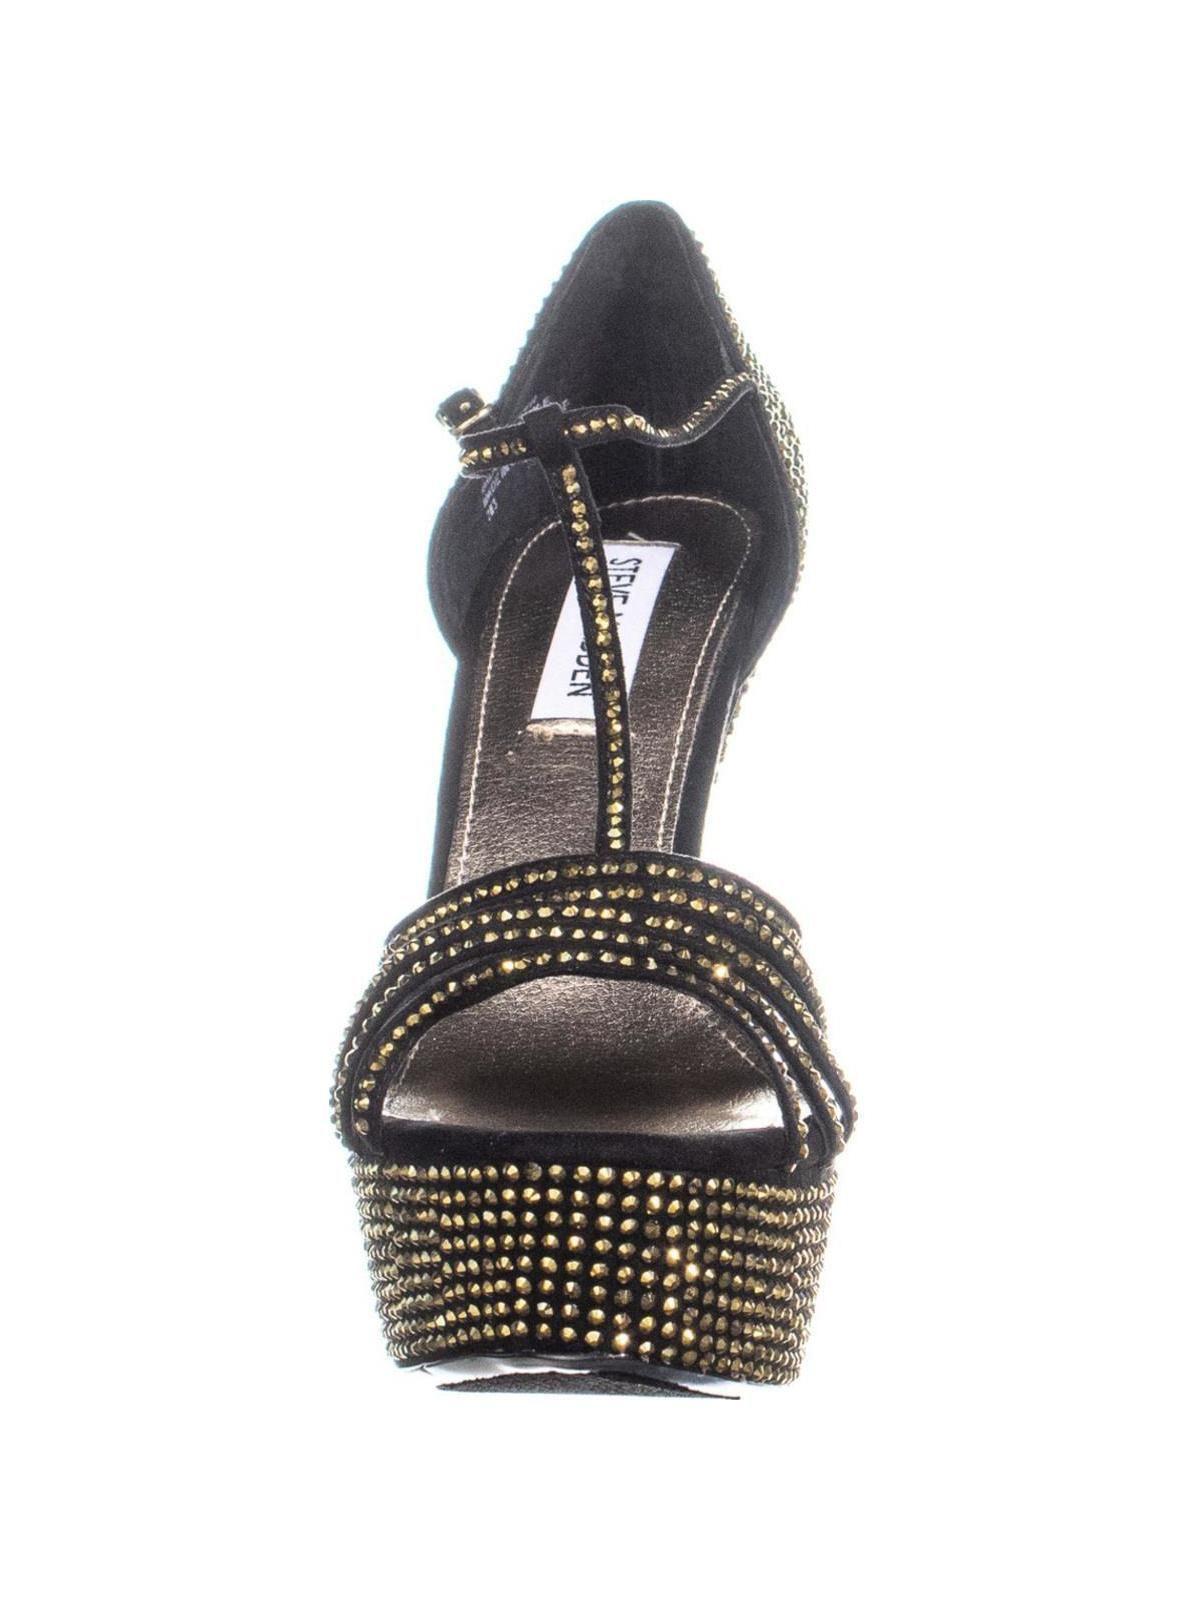 fe81a05a1b8 Lyst - Steve Madden Avory Us 9.5 Black Platform Sandals in Black - Save 13%